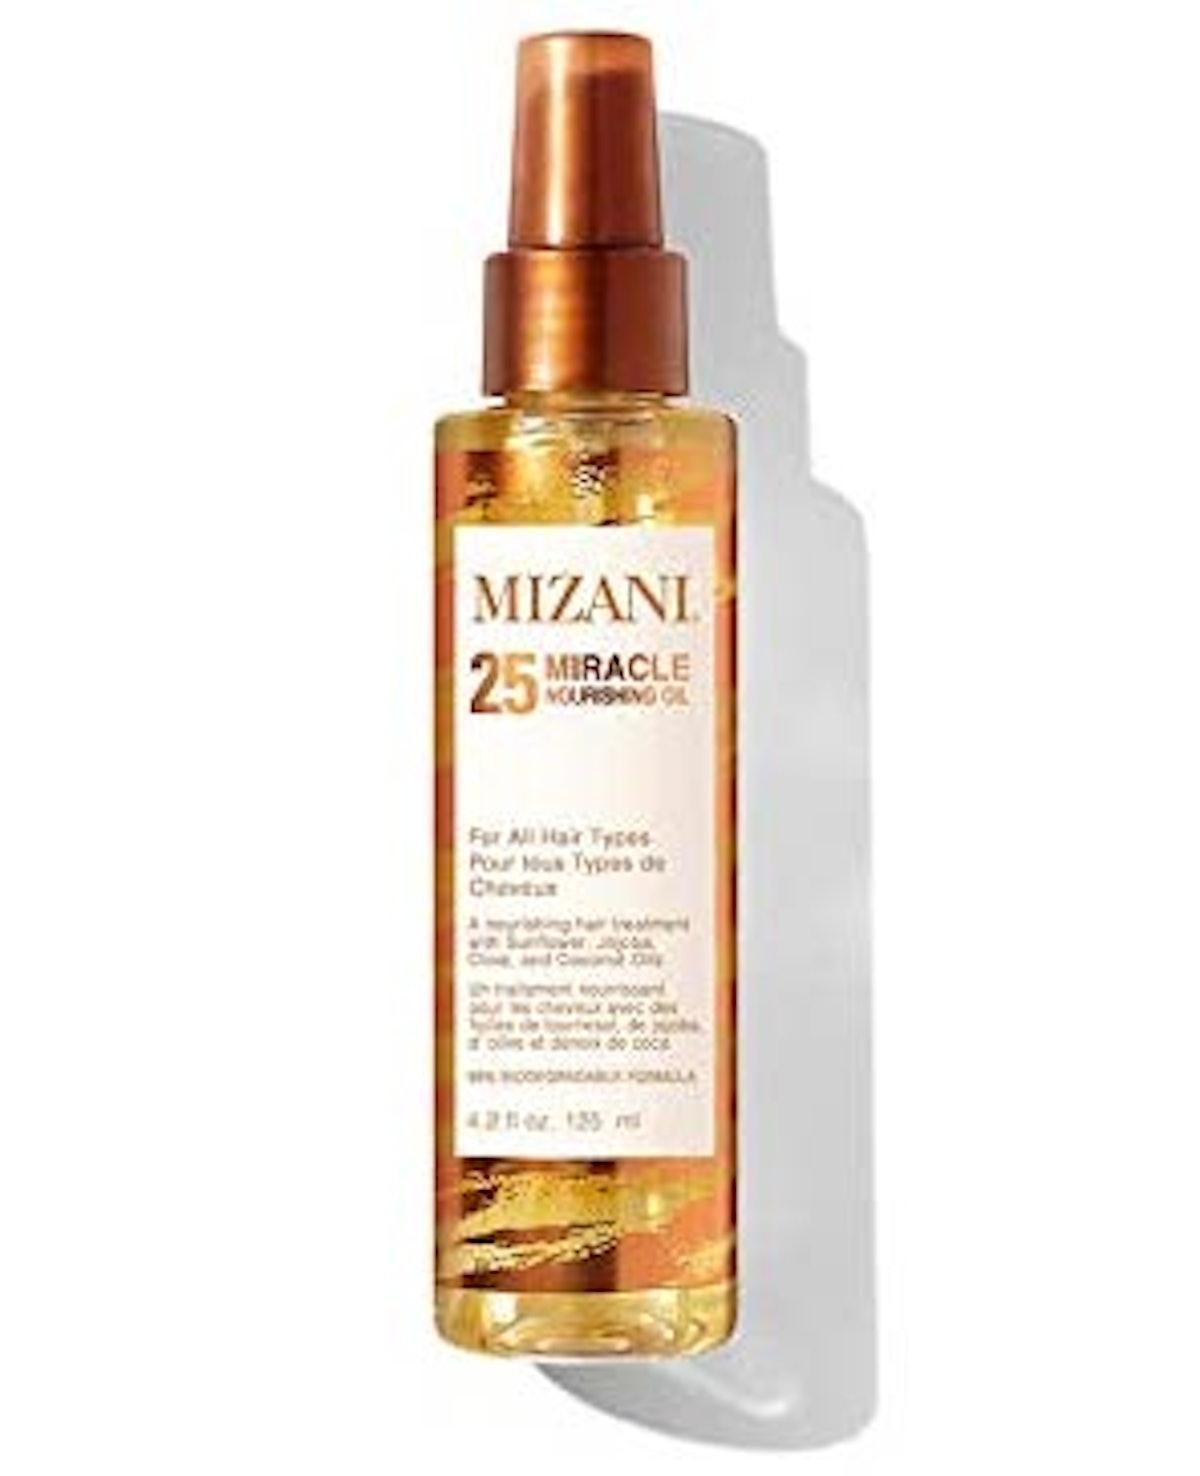 MIZANI 25 Miracle Nourishing Oil, 4.2 Fl. Oz.